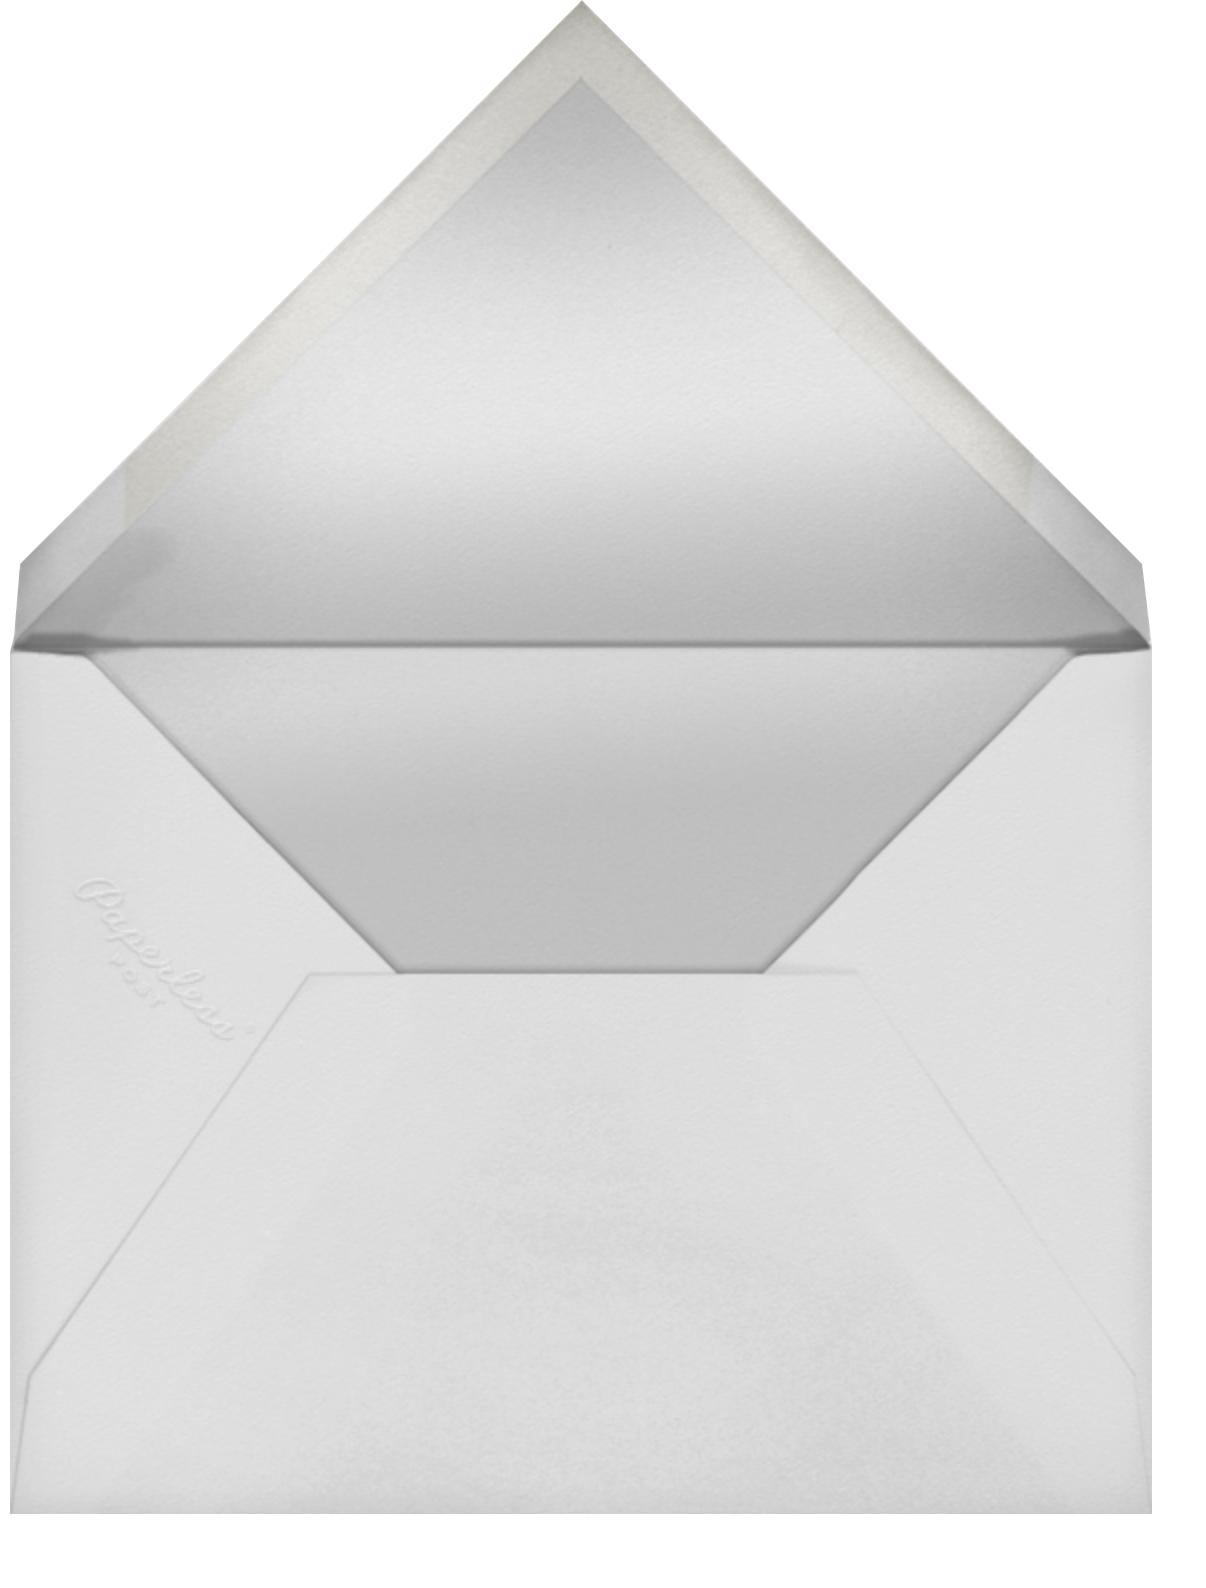 Marble Circle - White - Paperless Post - Envelope